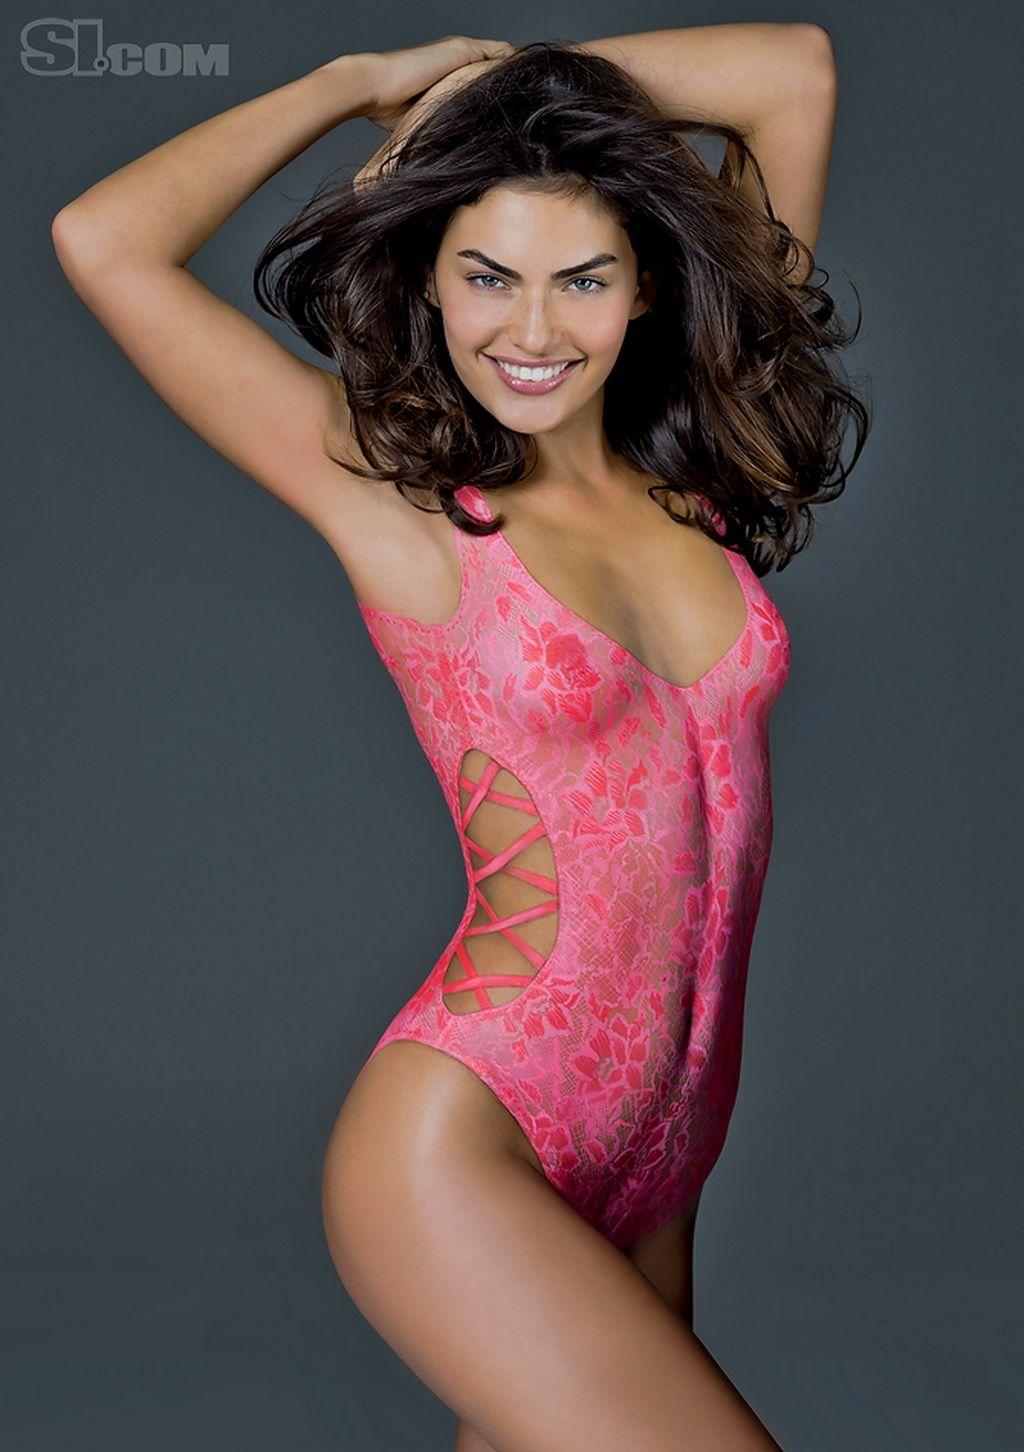 Hottest Bikini Models